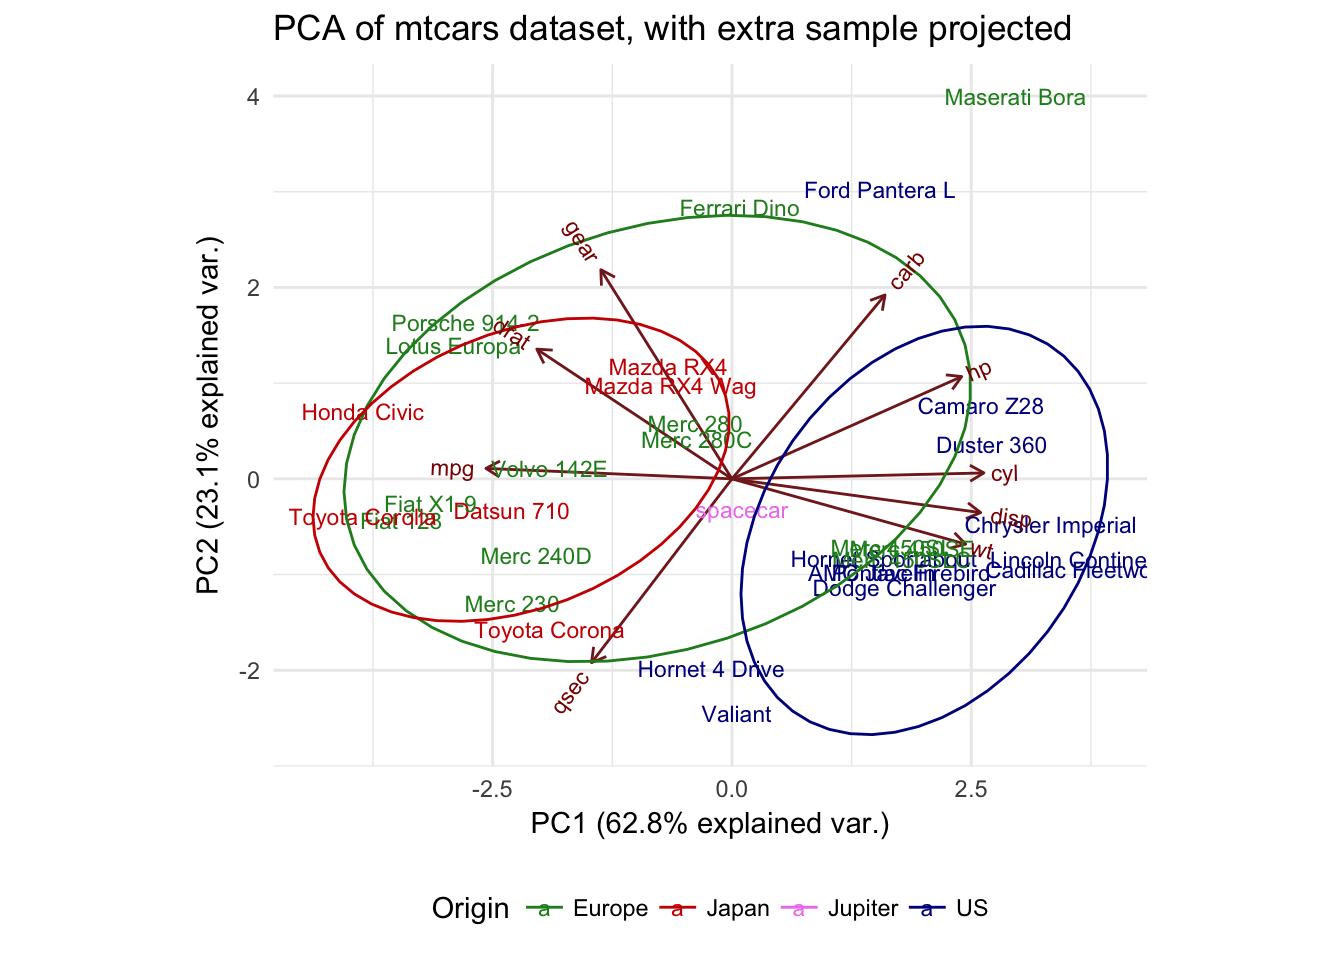 Pca Analysis In R Article Datacamp Raw 4 Toyota Engine Diagram Ggbiplot9 Wkj9tb